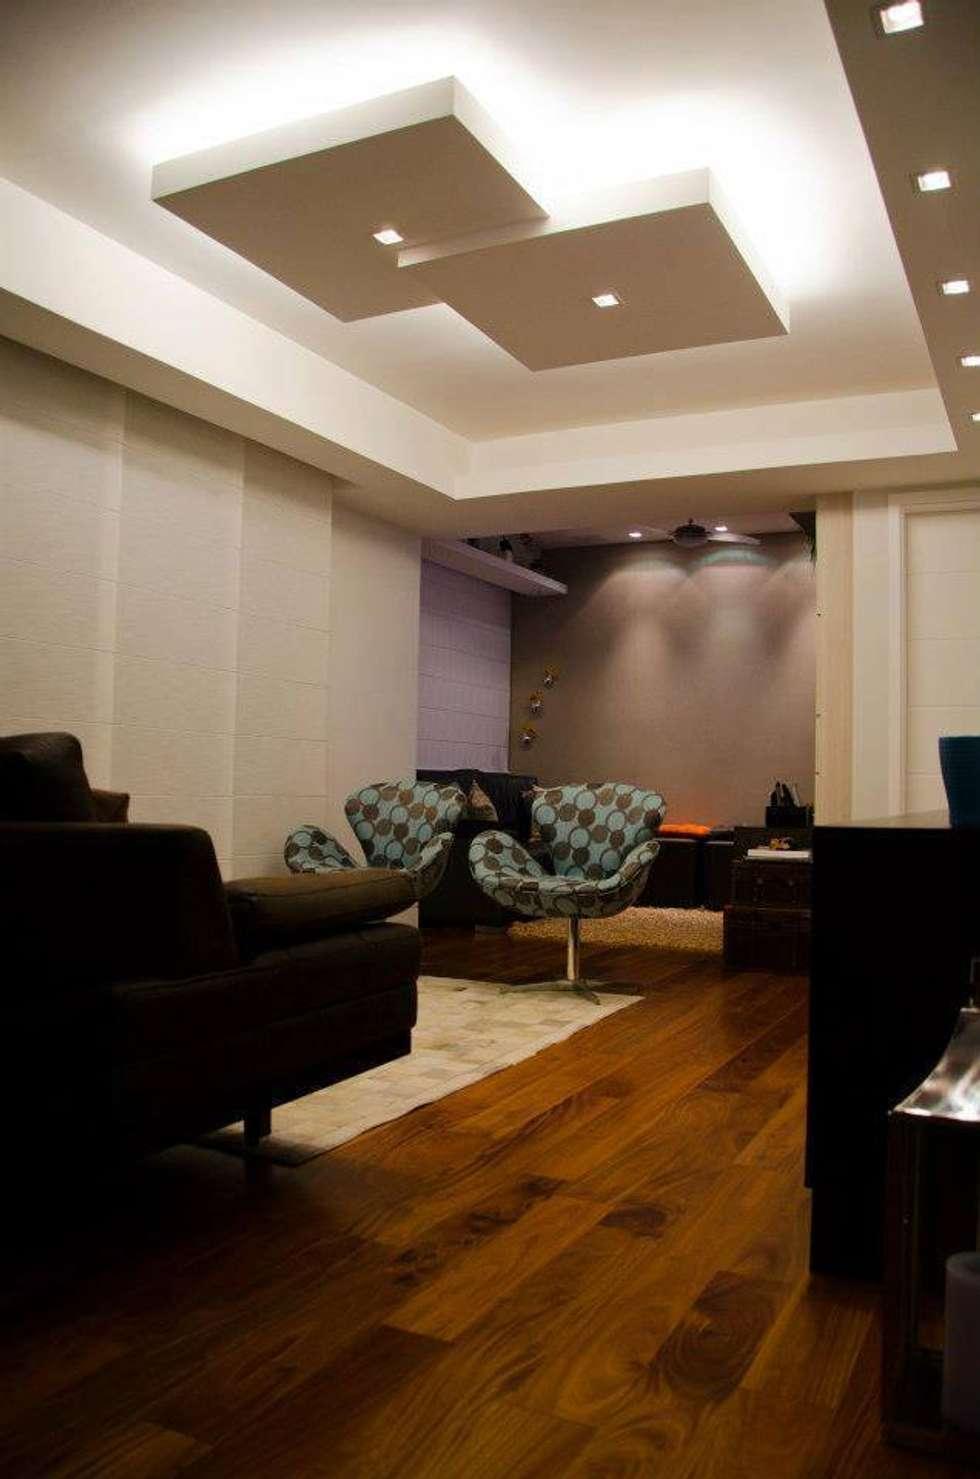 Sala de Estar : Salas de estar modernas por Paula Werneck Arquitetura